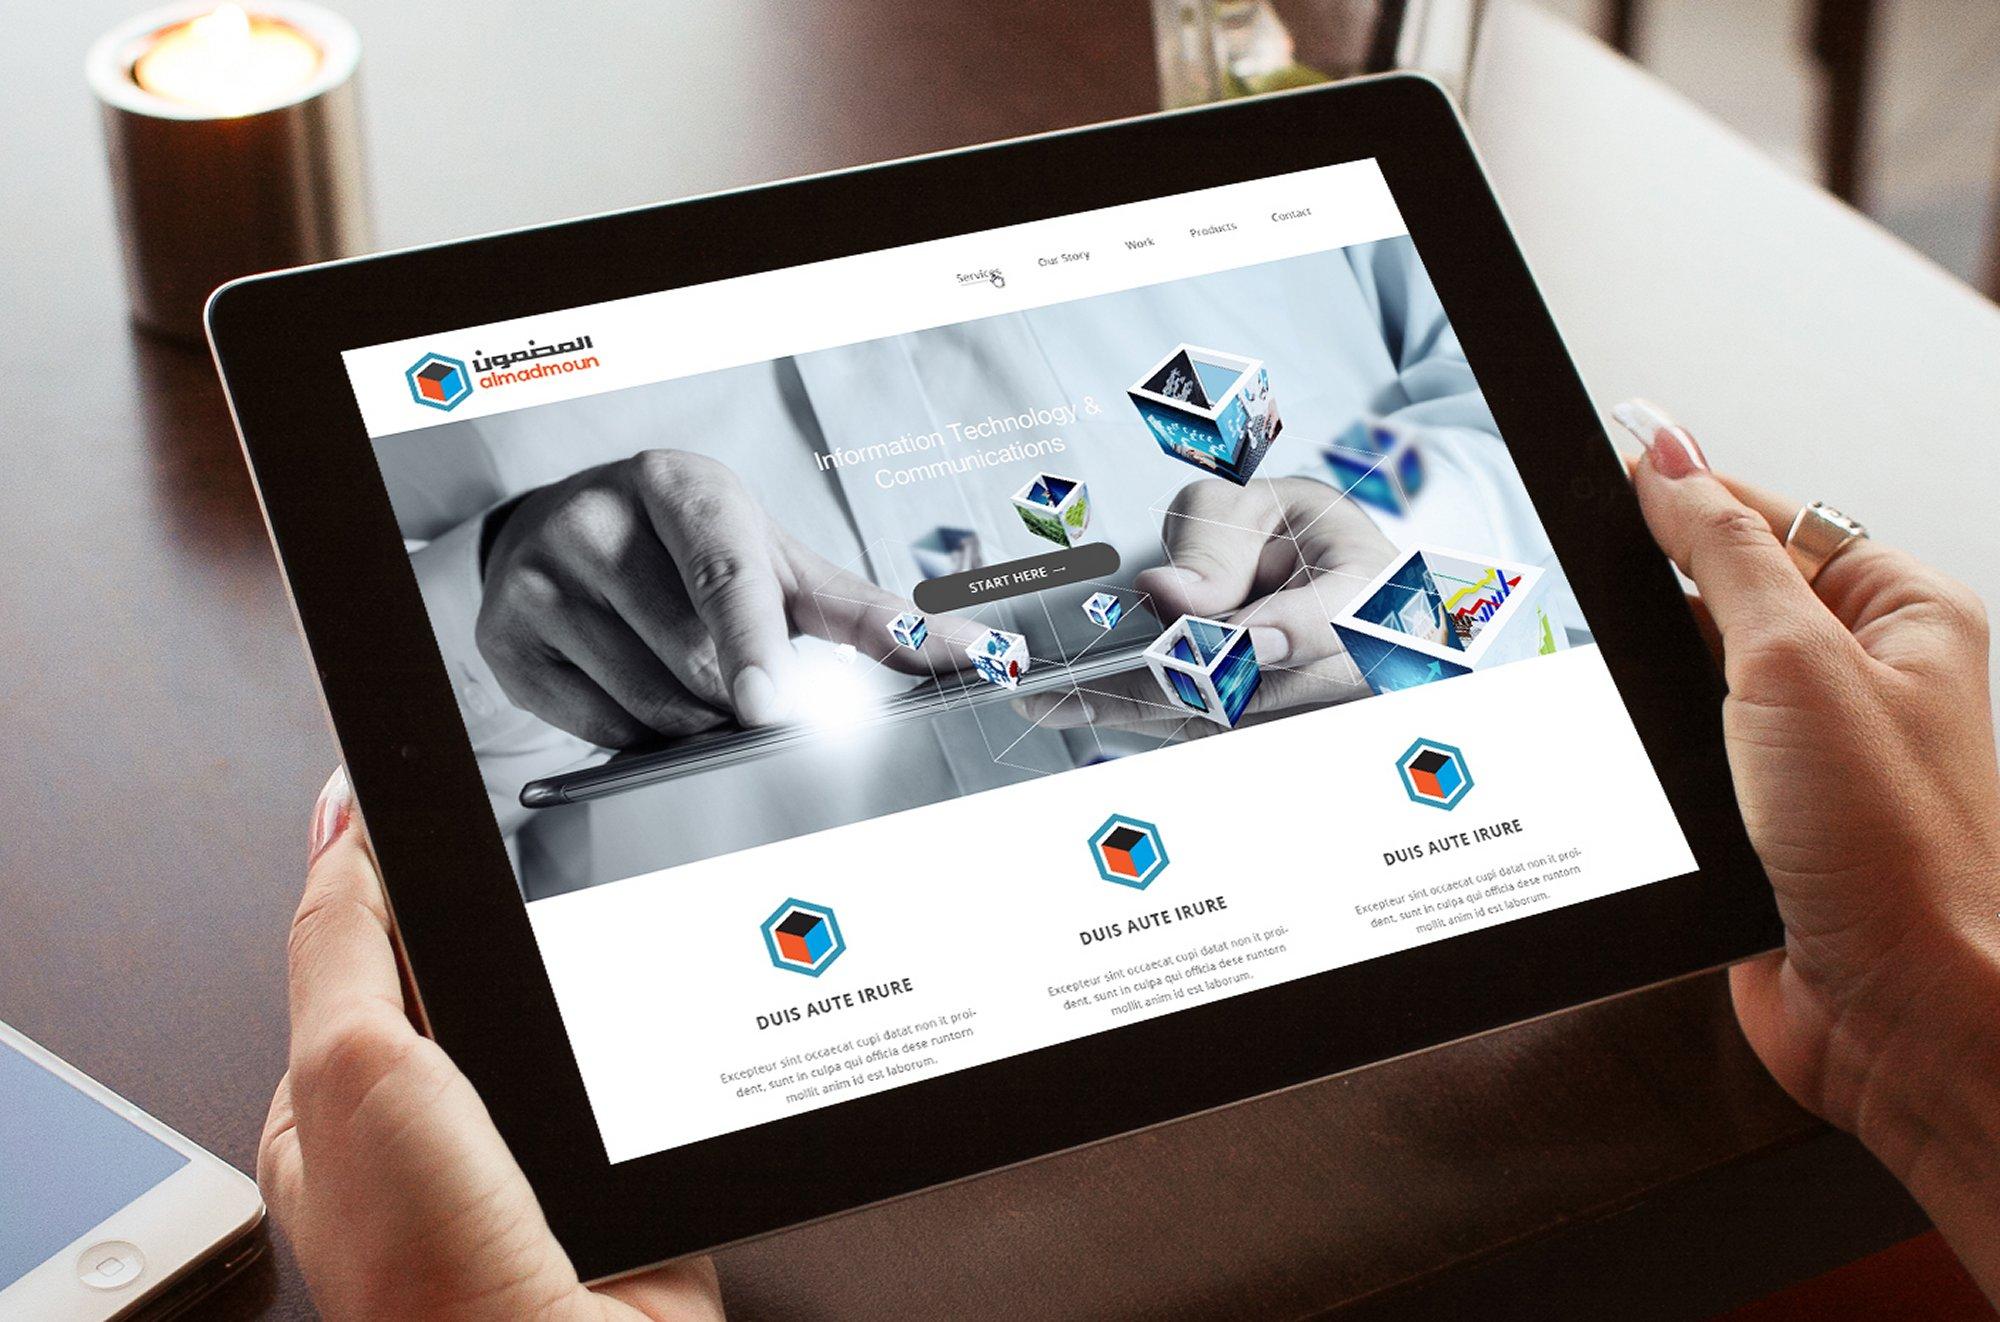 Al Madmoun Web Design